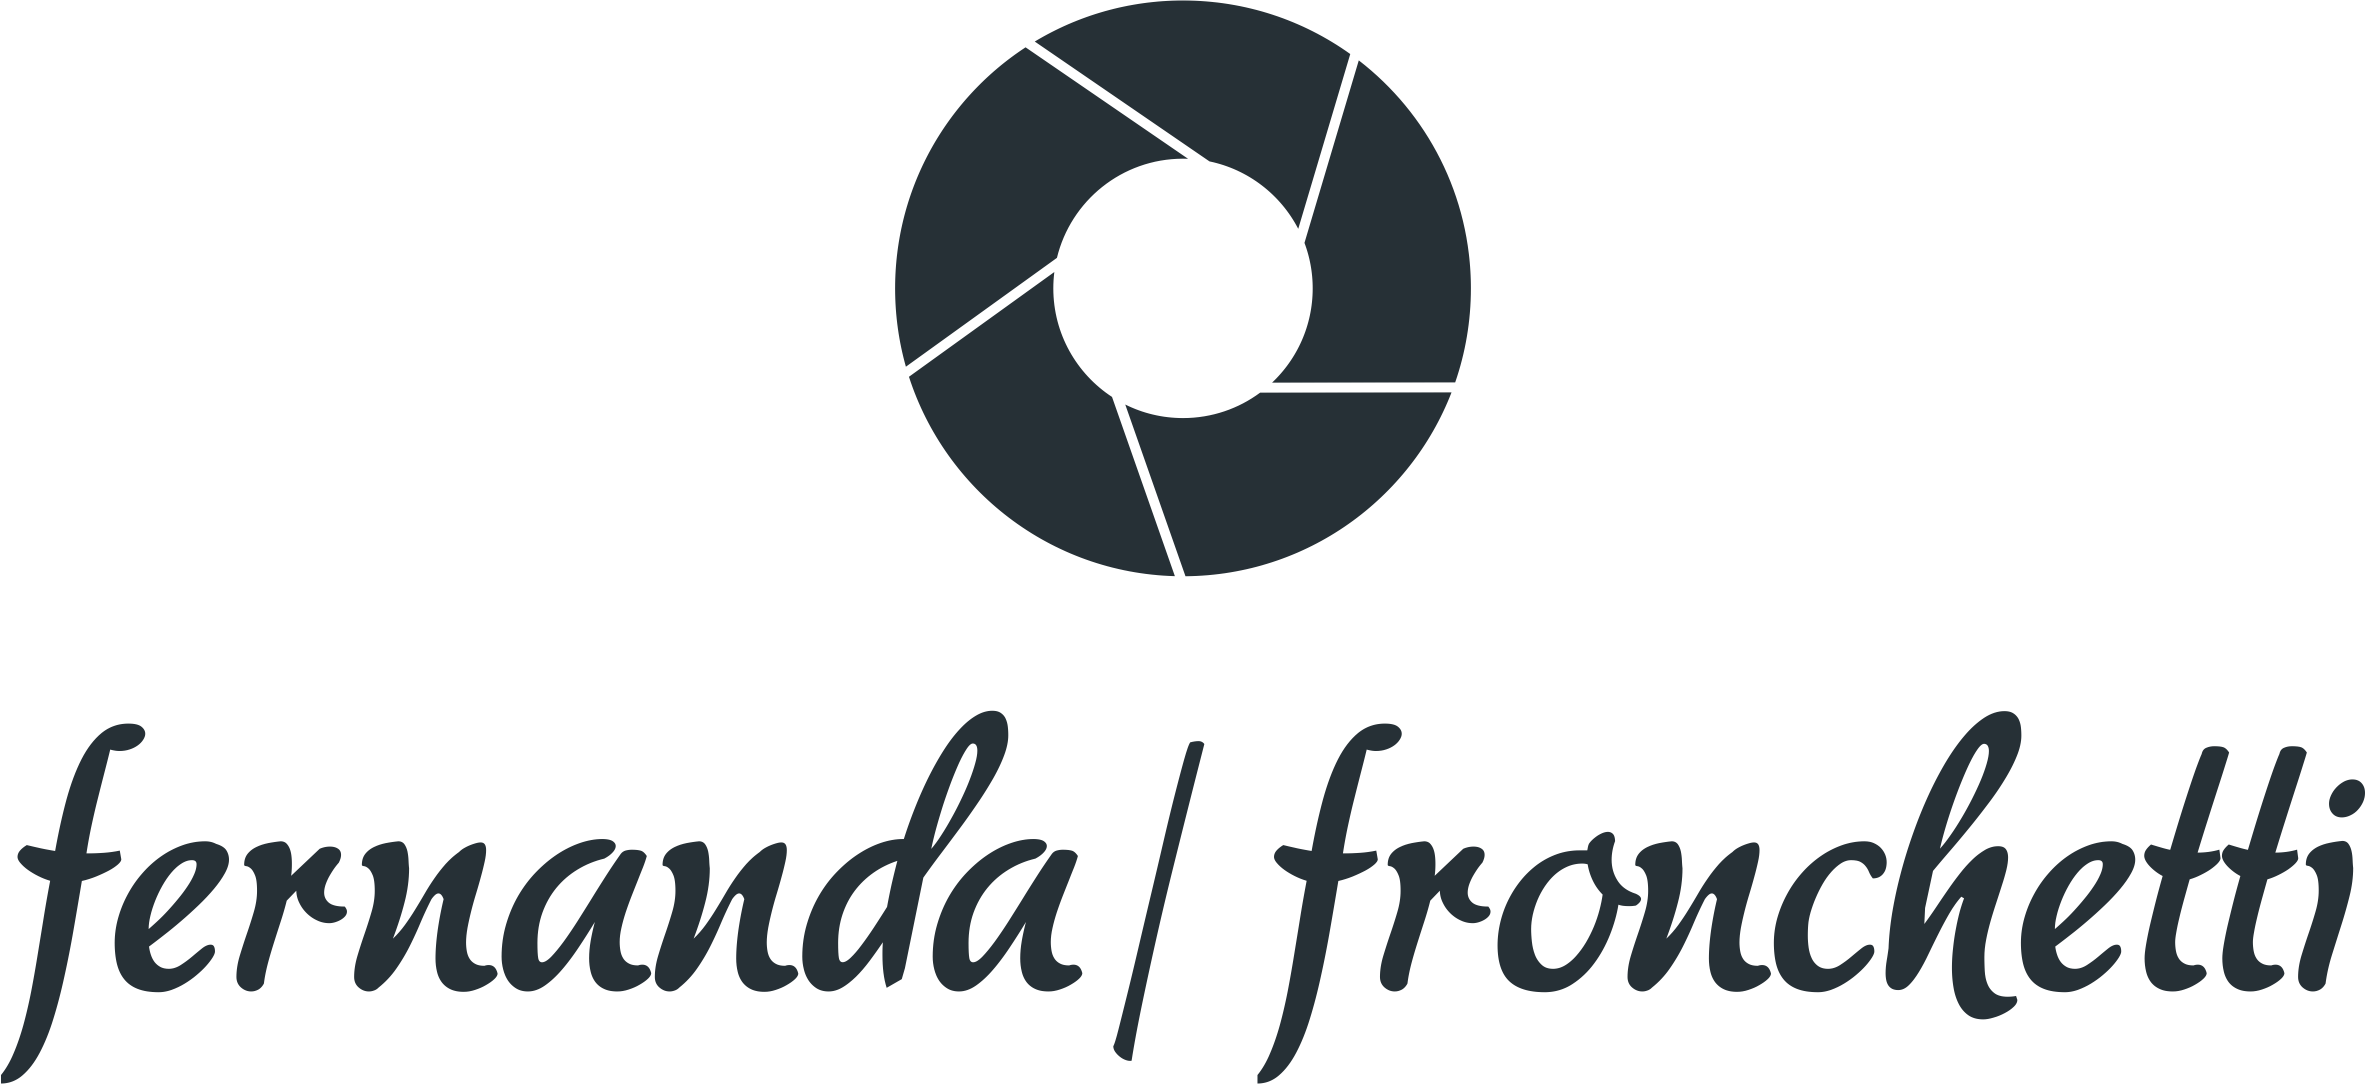 Logotipo de Fernanda Fronchetti